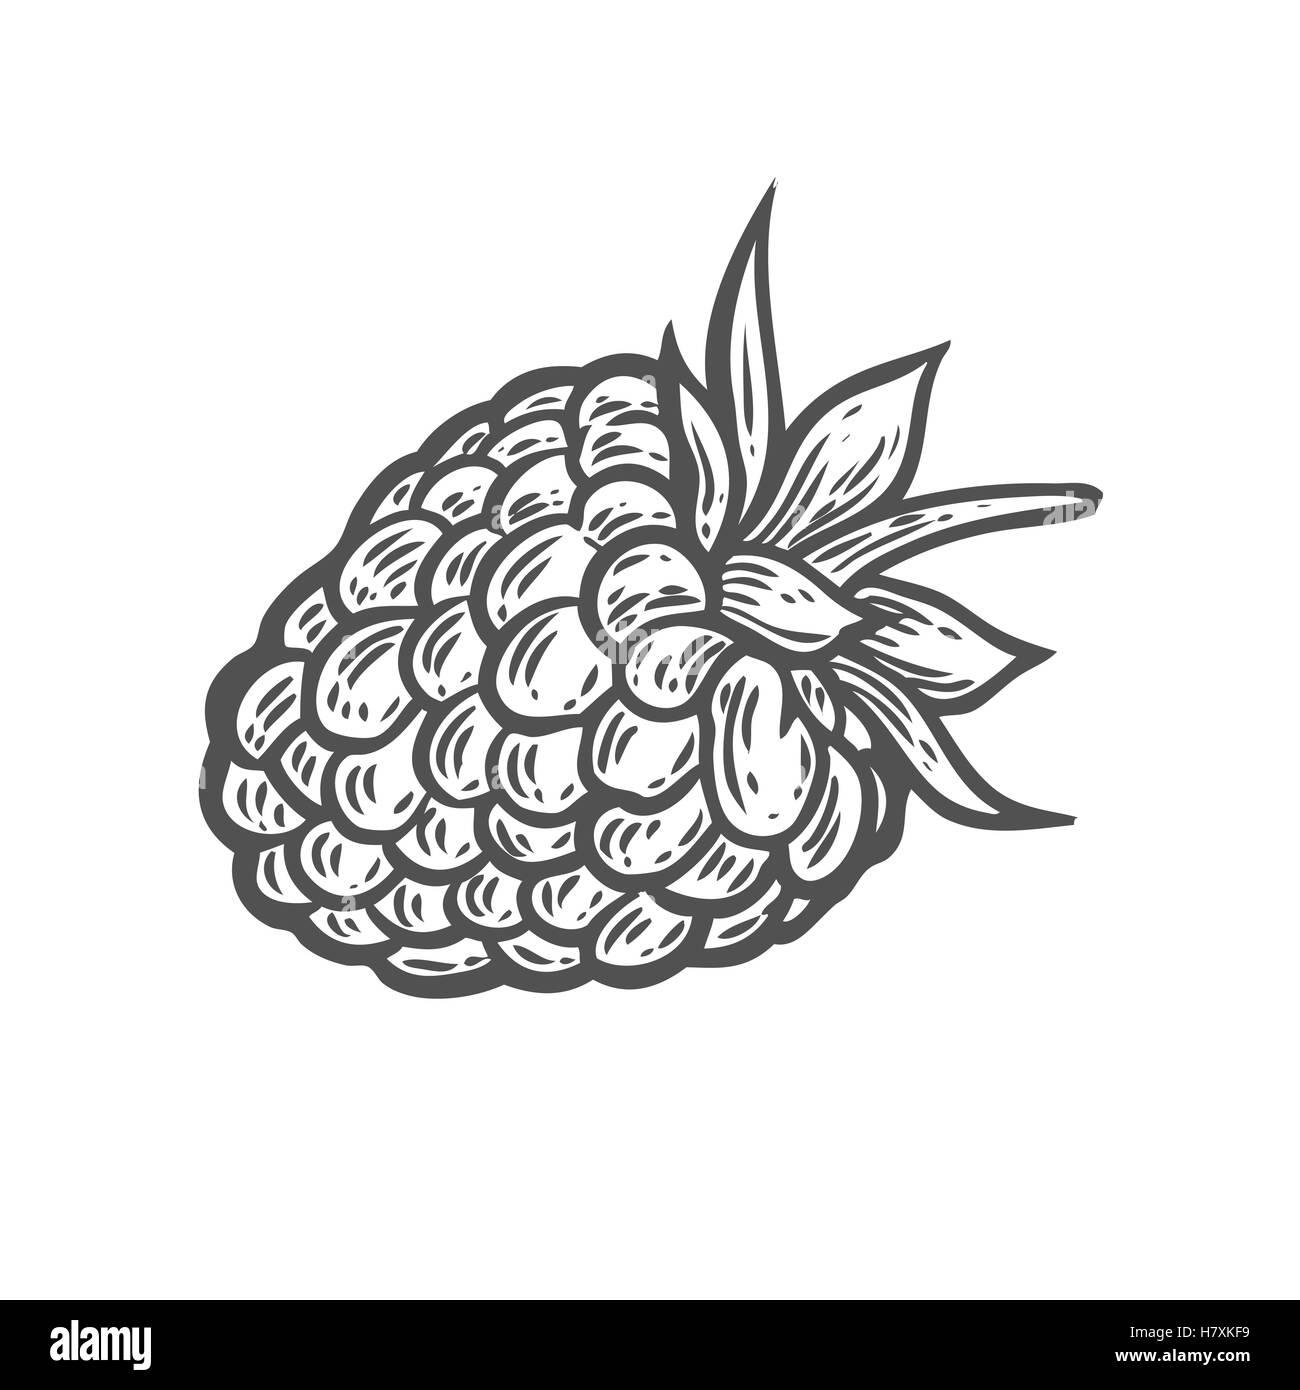 Raspberry illustration